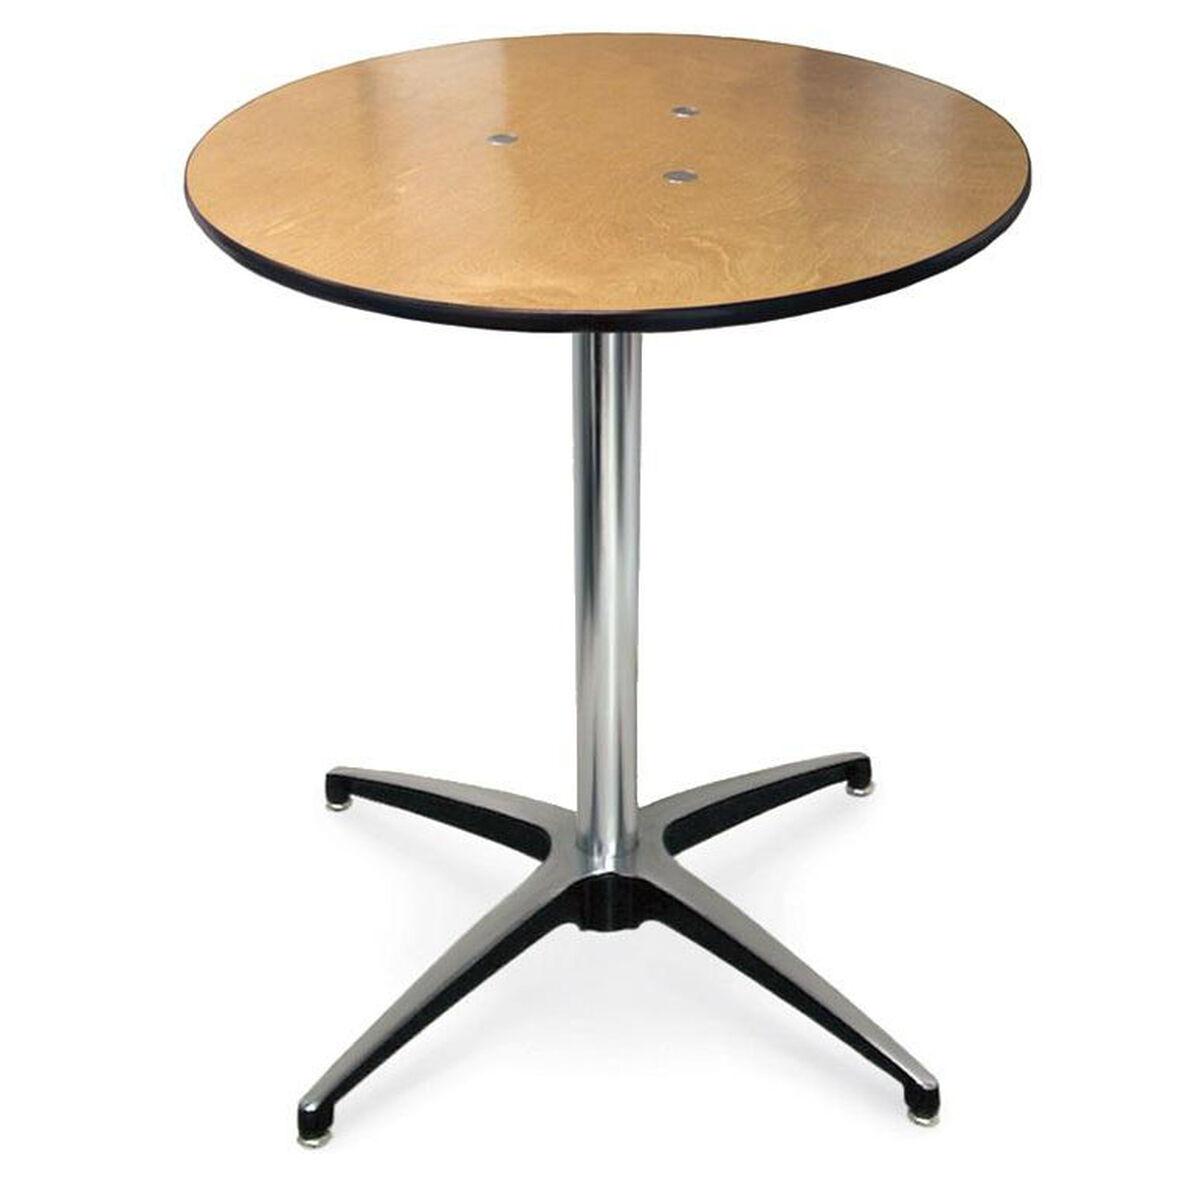 Round Plywood Pedestal Table 72012 ...